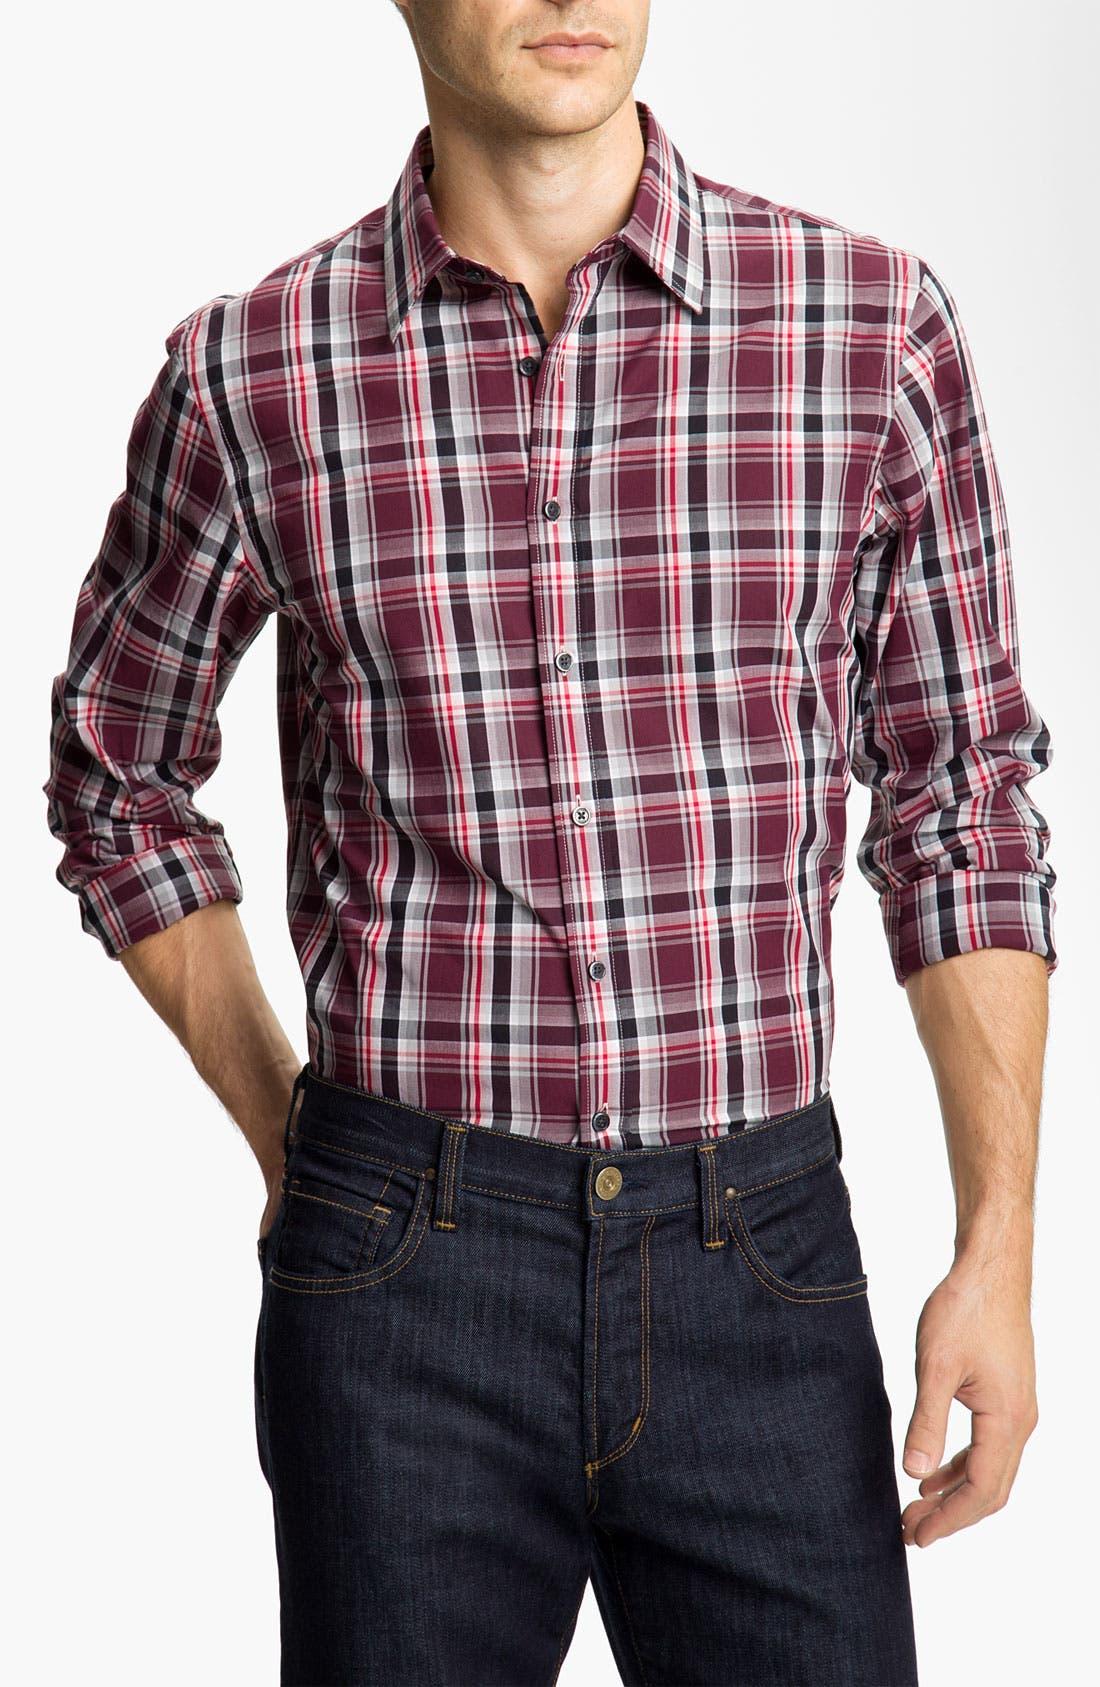 Main Image - Michael Kors 'Halden Check' Sport Shirt